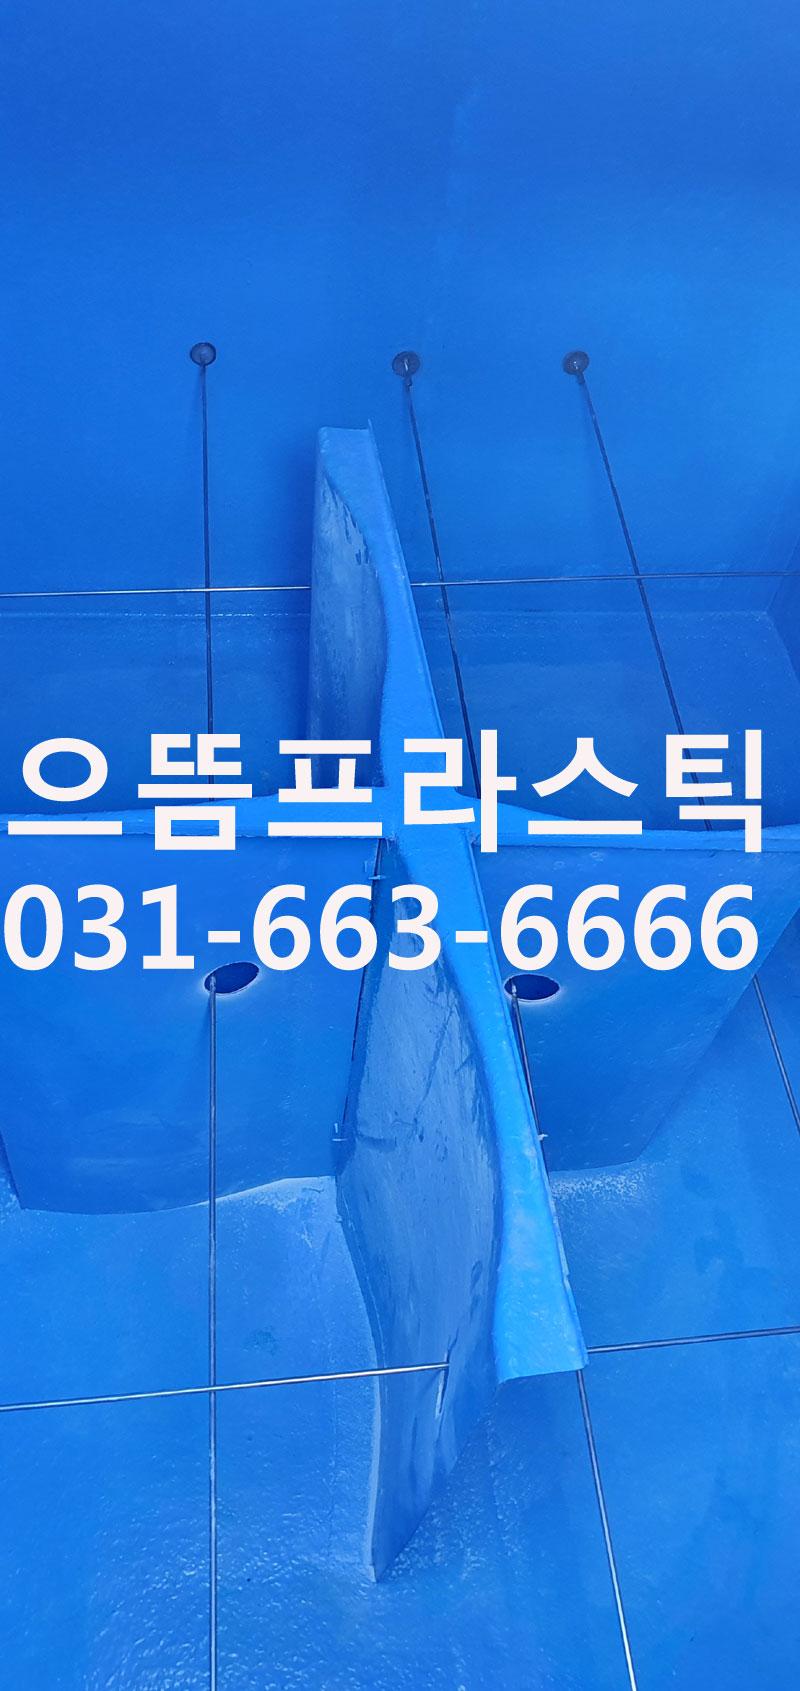 ff28a37f922718681f2f612418f7e00a_1628057733_2738.jpg